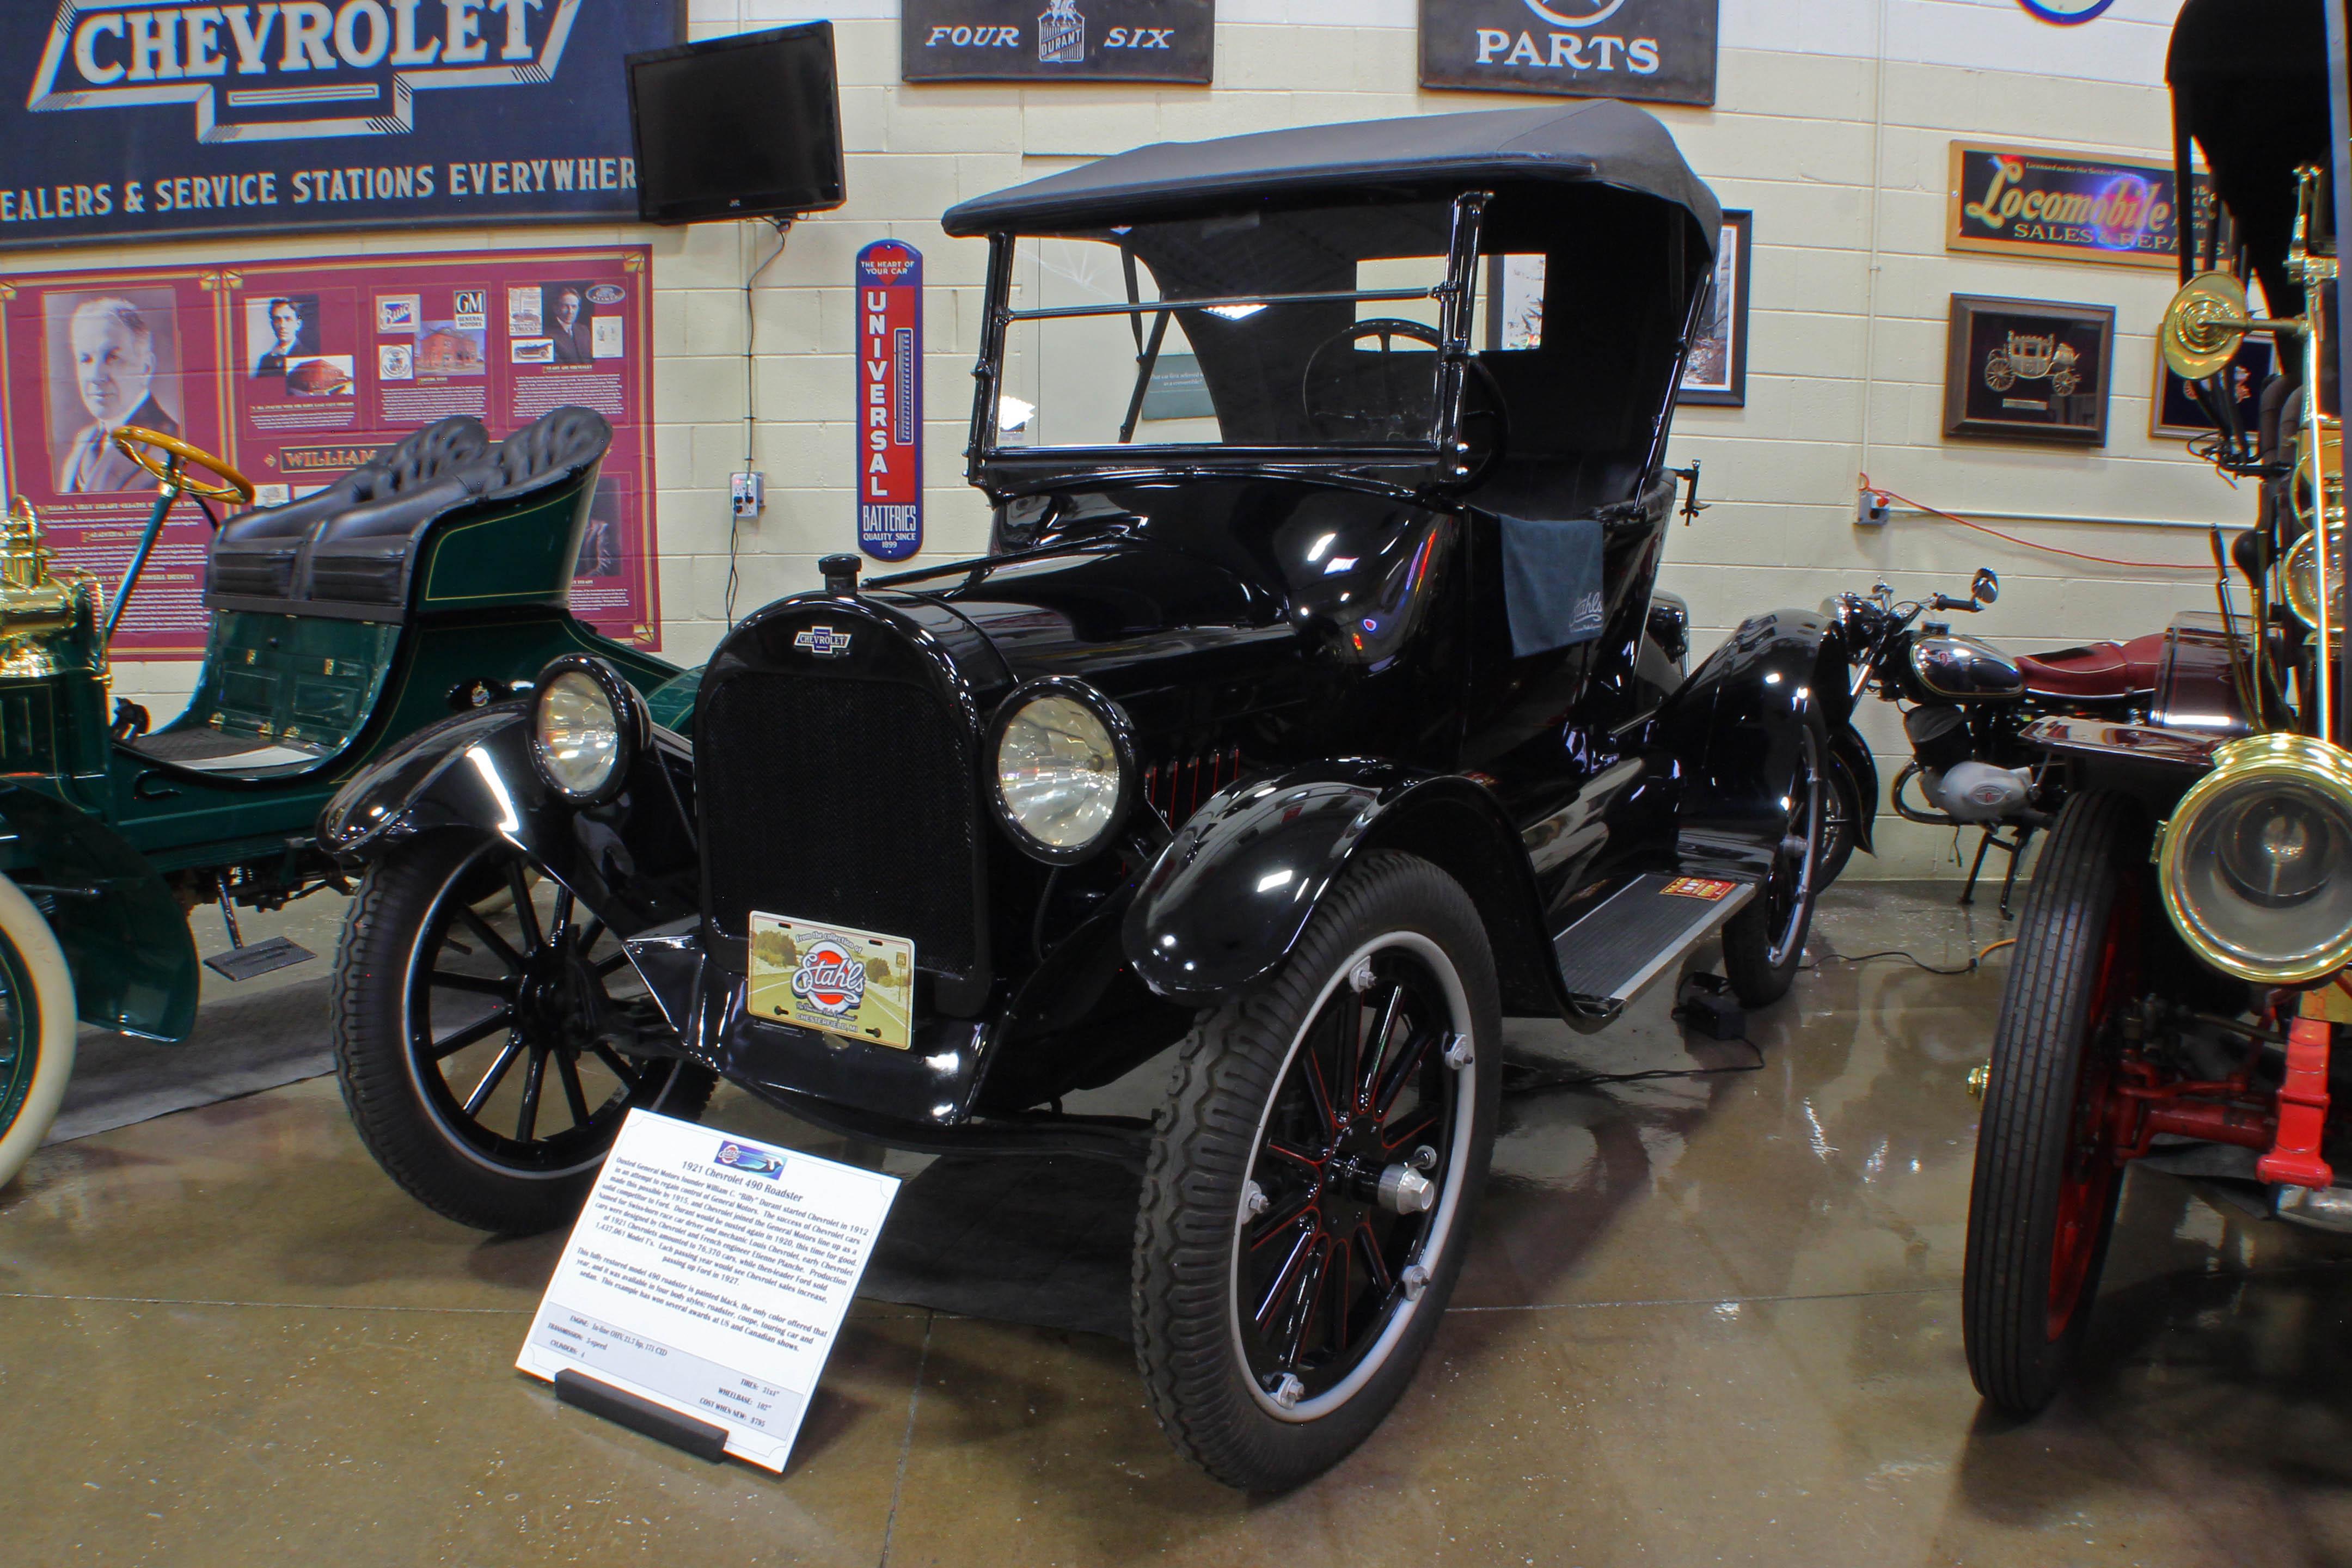 1921 Chevrolet 490 - Stahls Automotive Collection